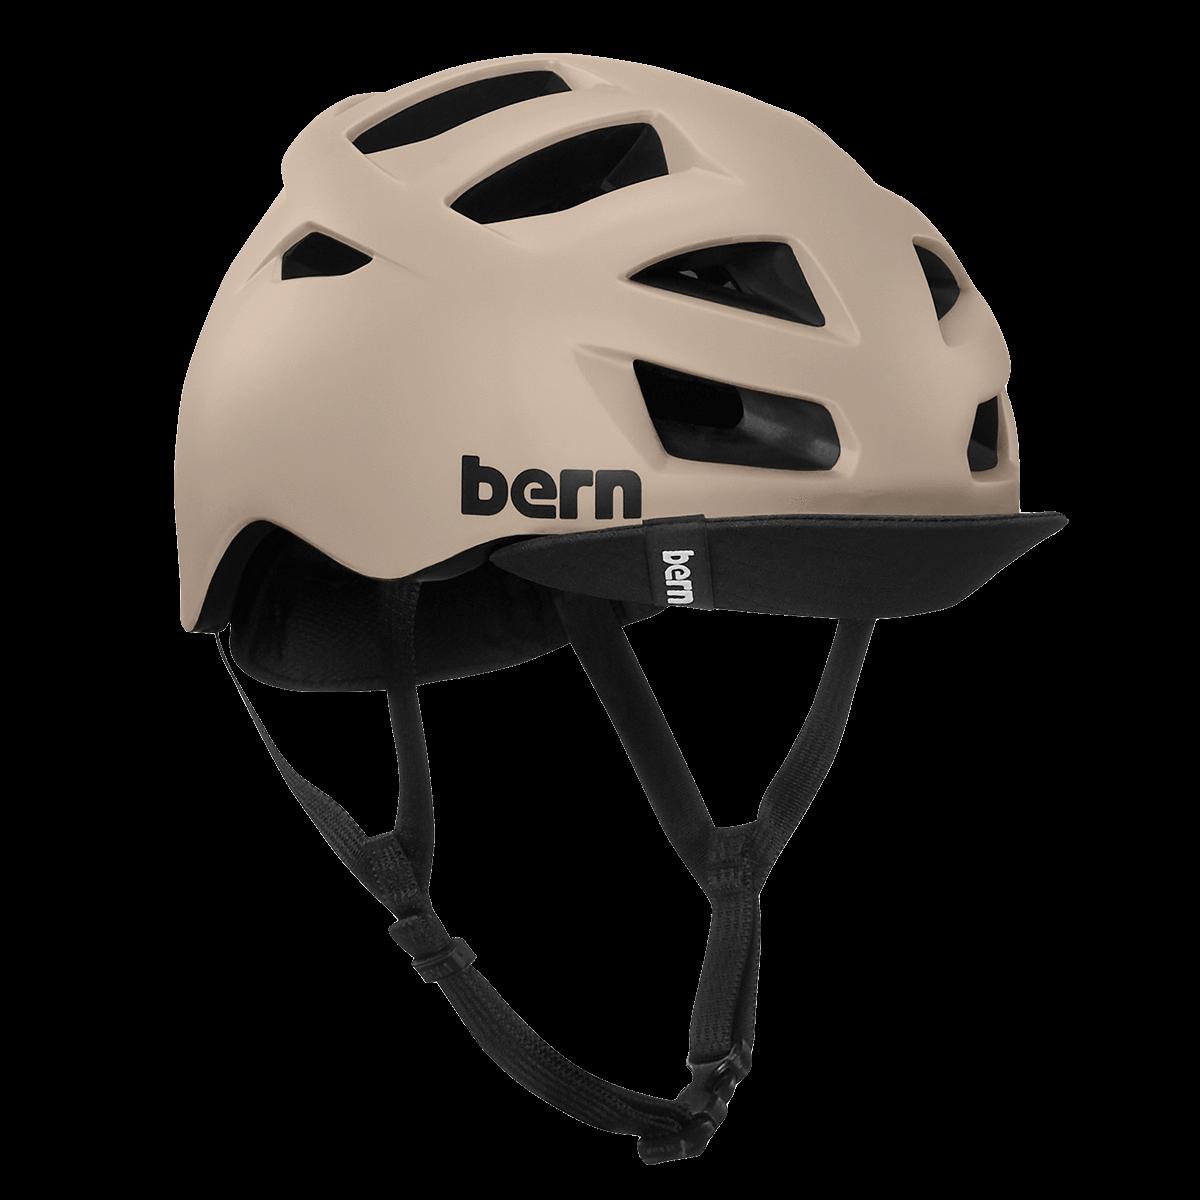 Casque Bern Allston-Matte-Sand Esprit vélo